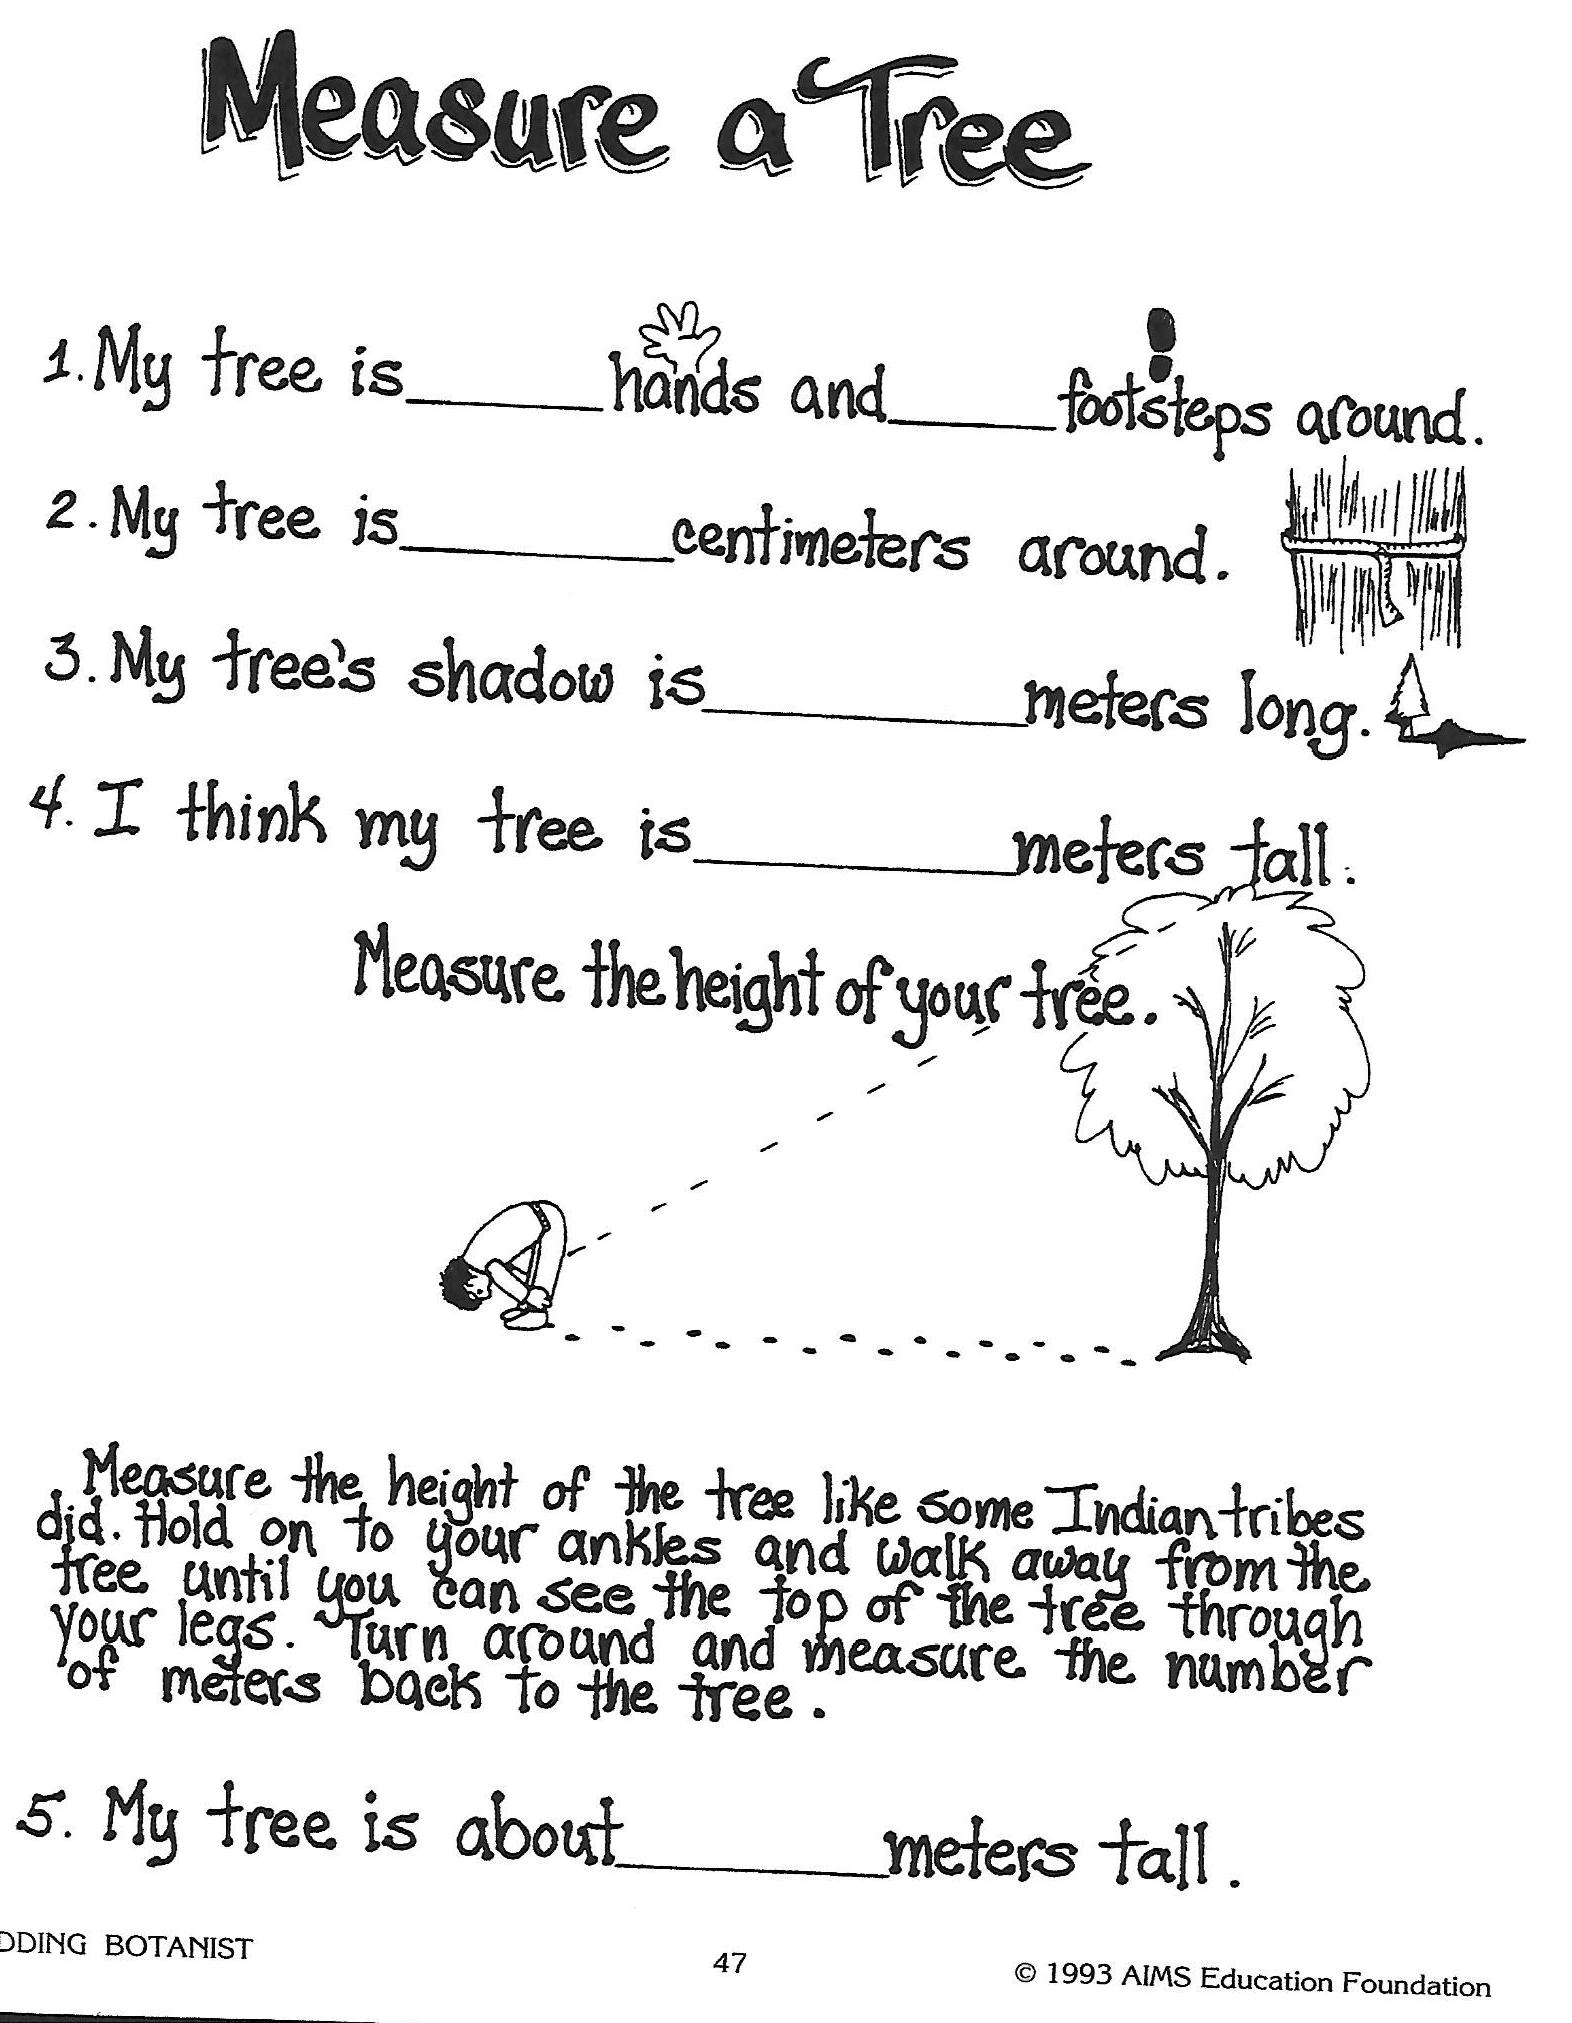 Image Measure A Tree Worksheetg Trees Of Texas Wikia Fandom